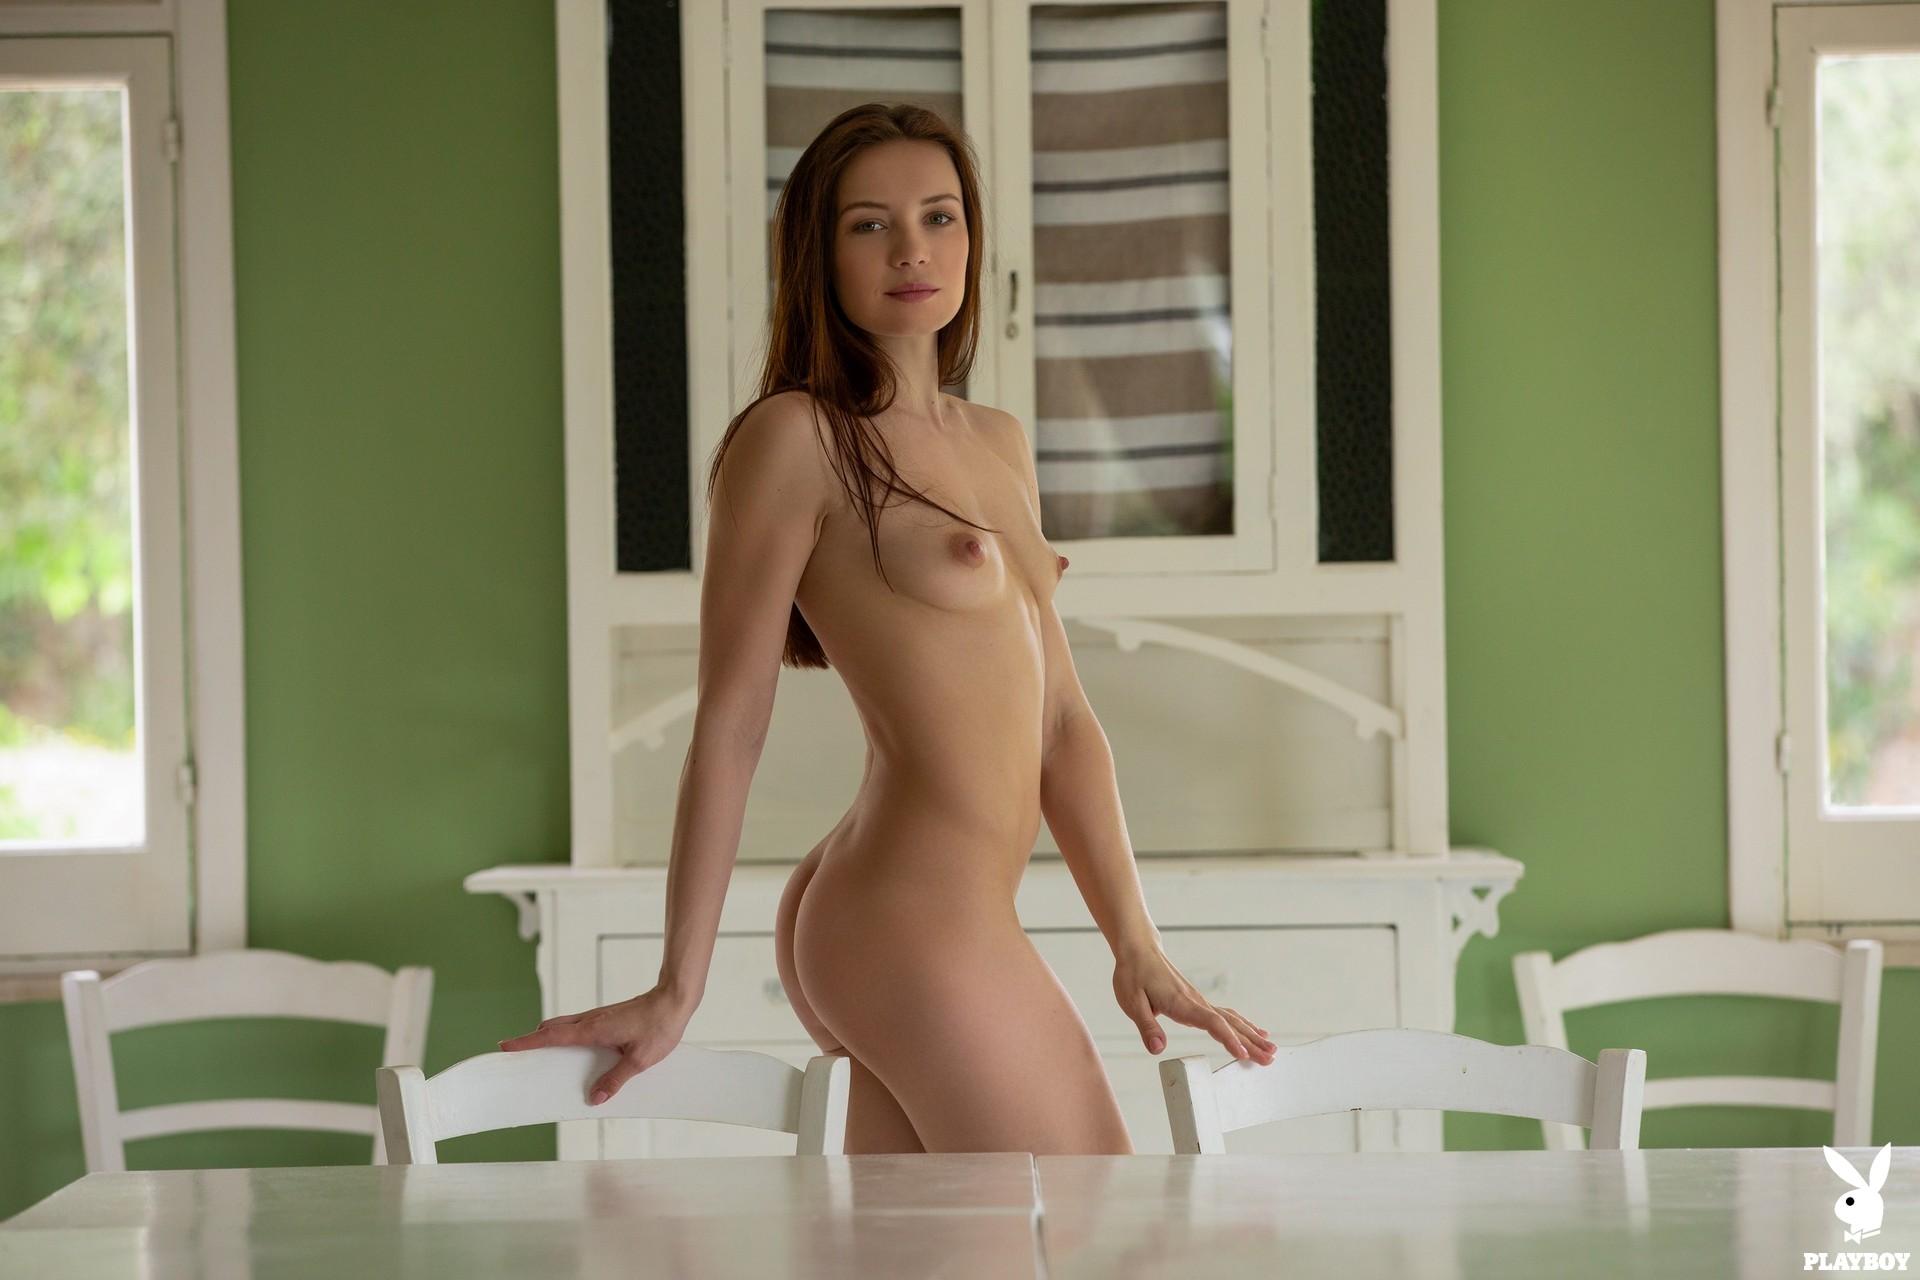 Janeth Tense in Delightful Daybreak - Playboy Plus 27